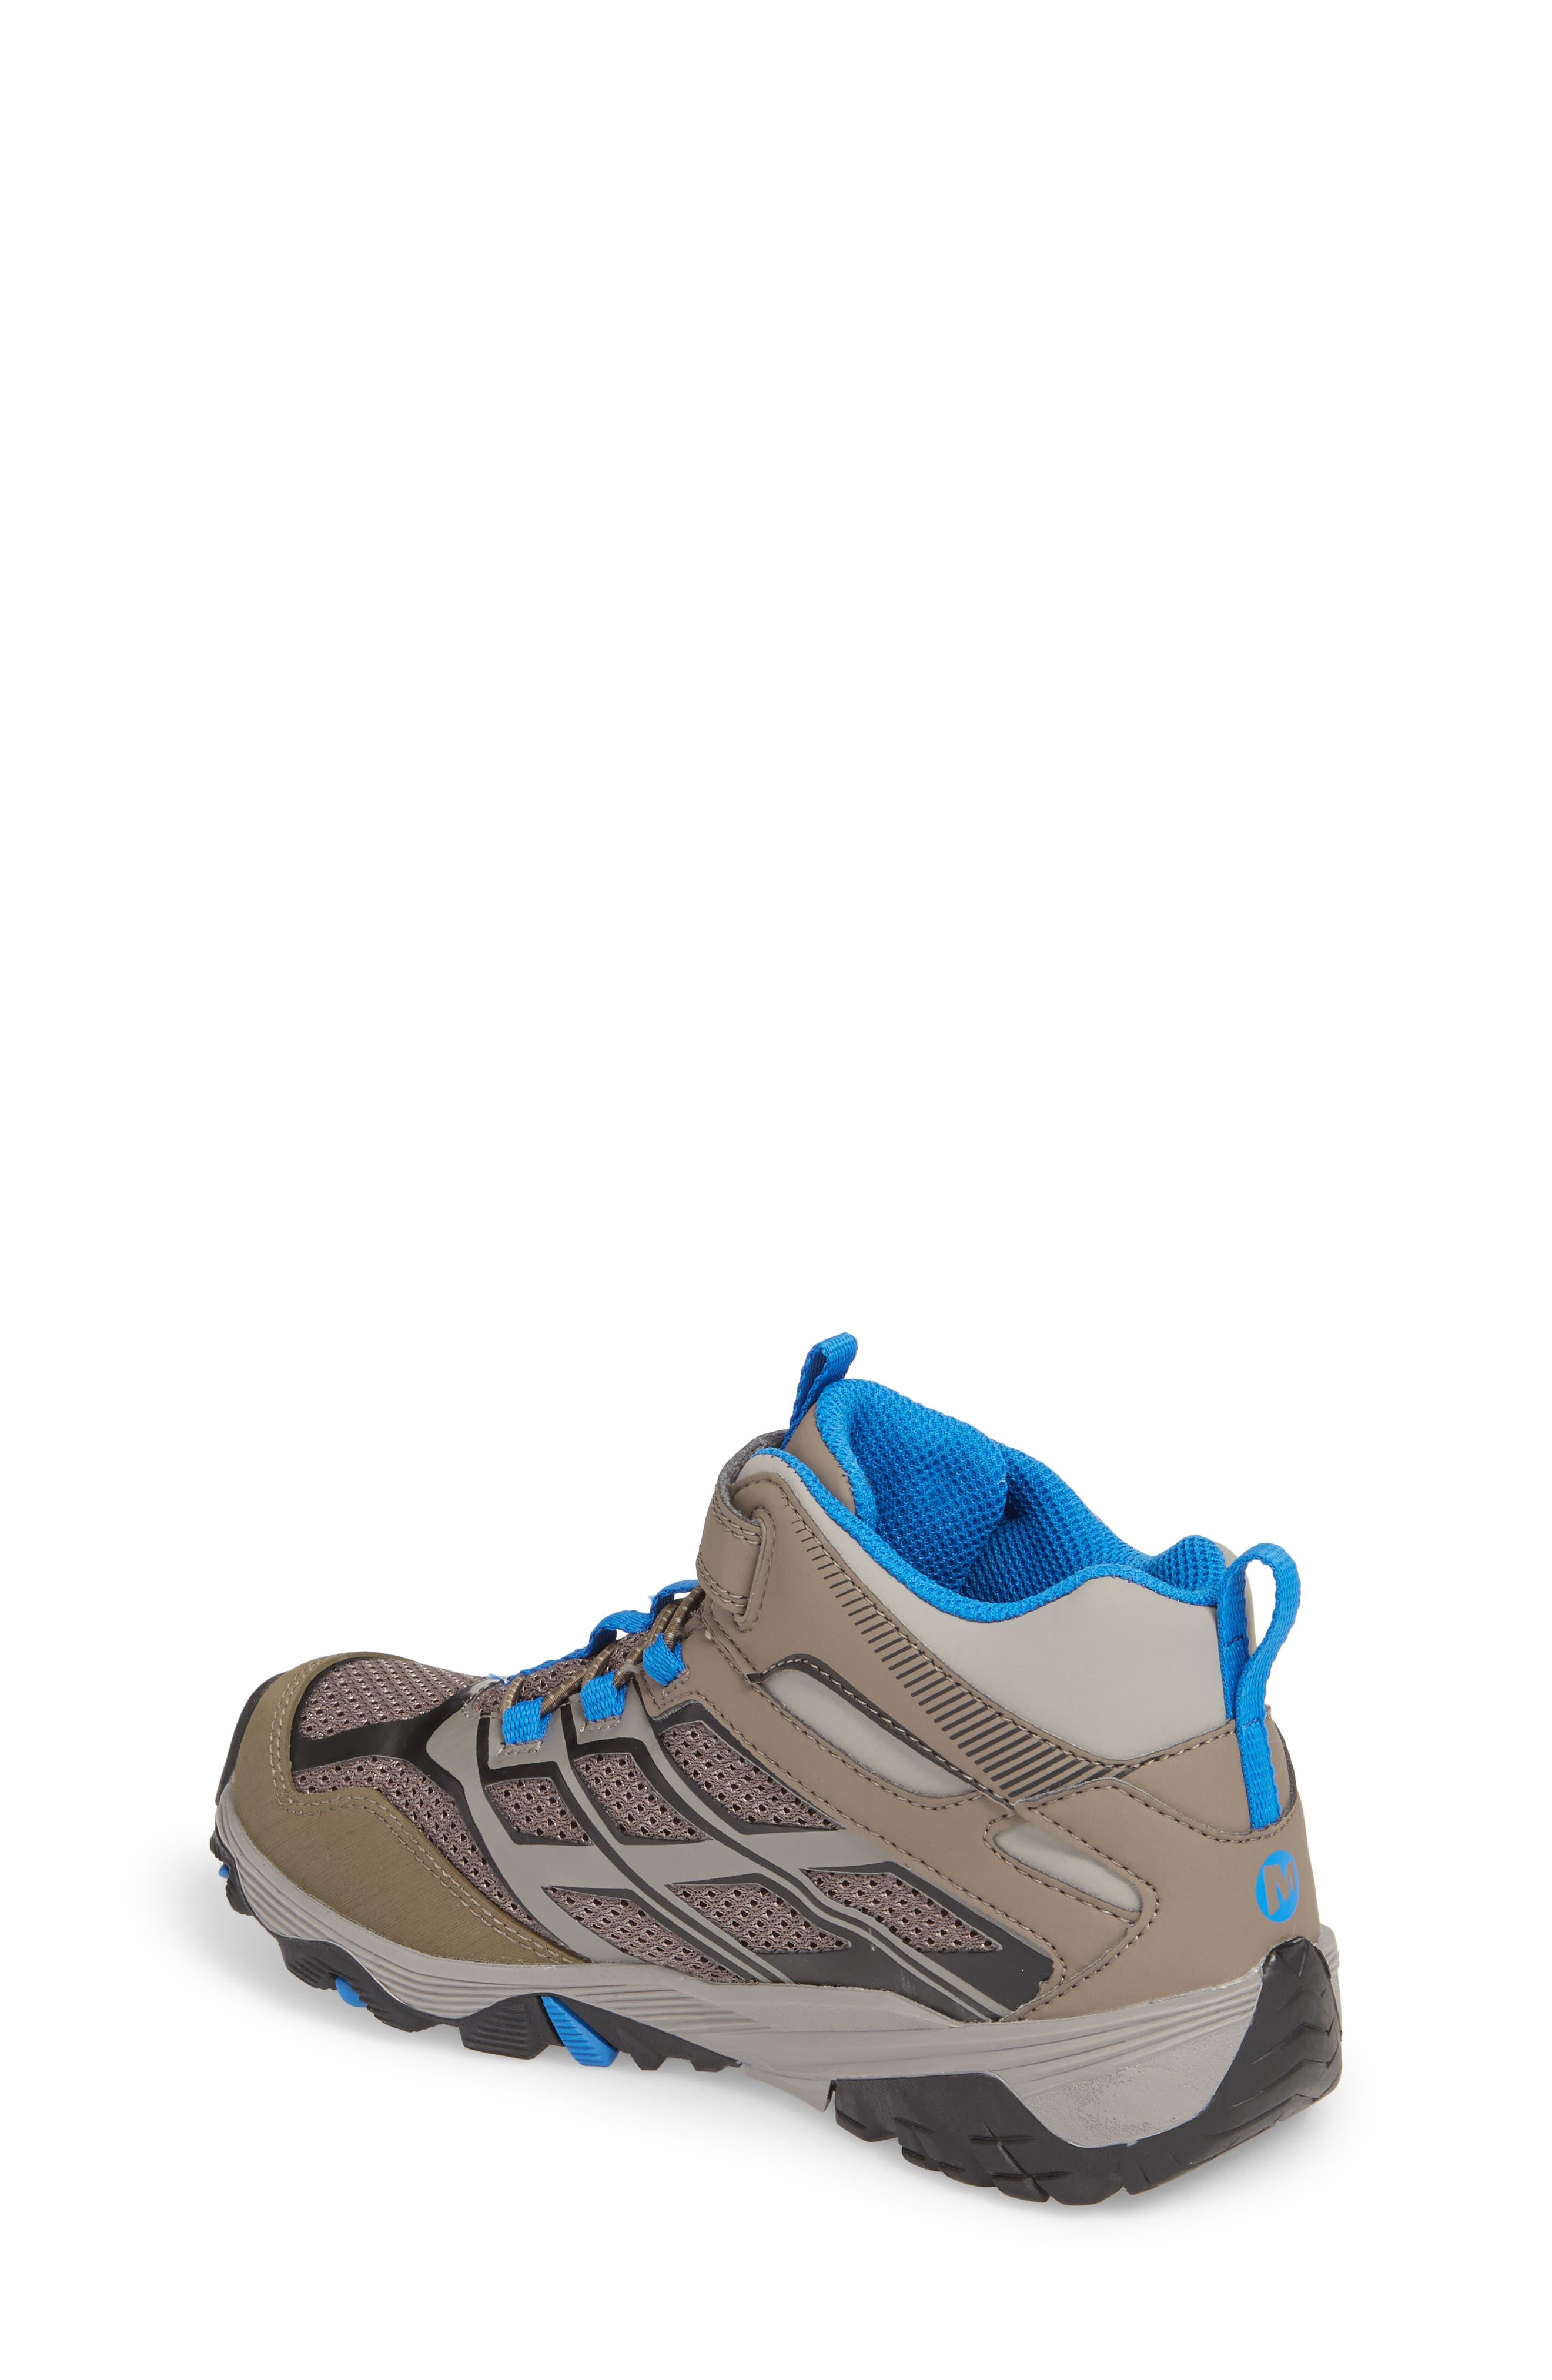 Alternate Image 2  - Merrell Moab FST Mid Top Waterproof Sneaker Boot (Toddler, Little Kid & Big Kid)